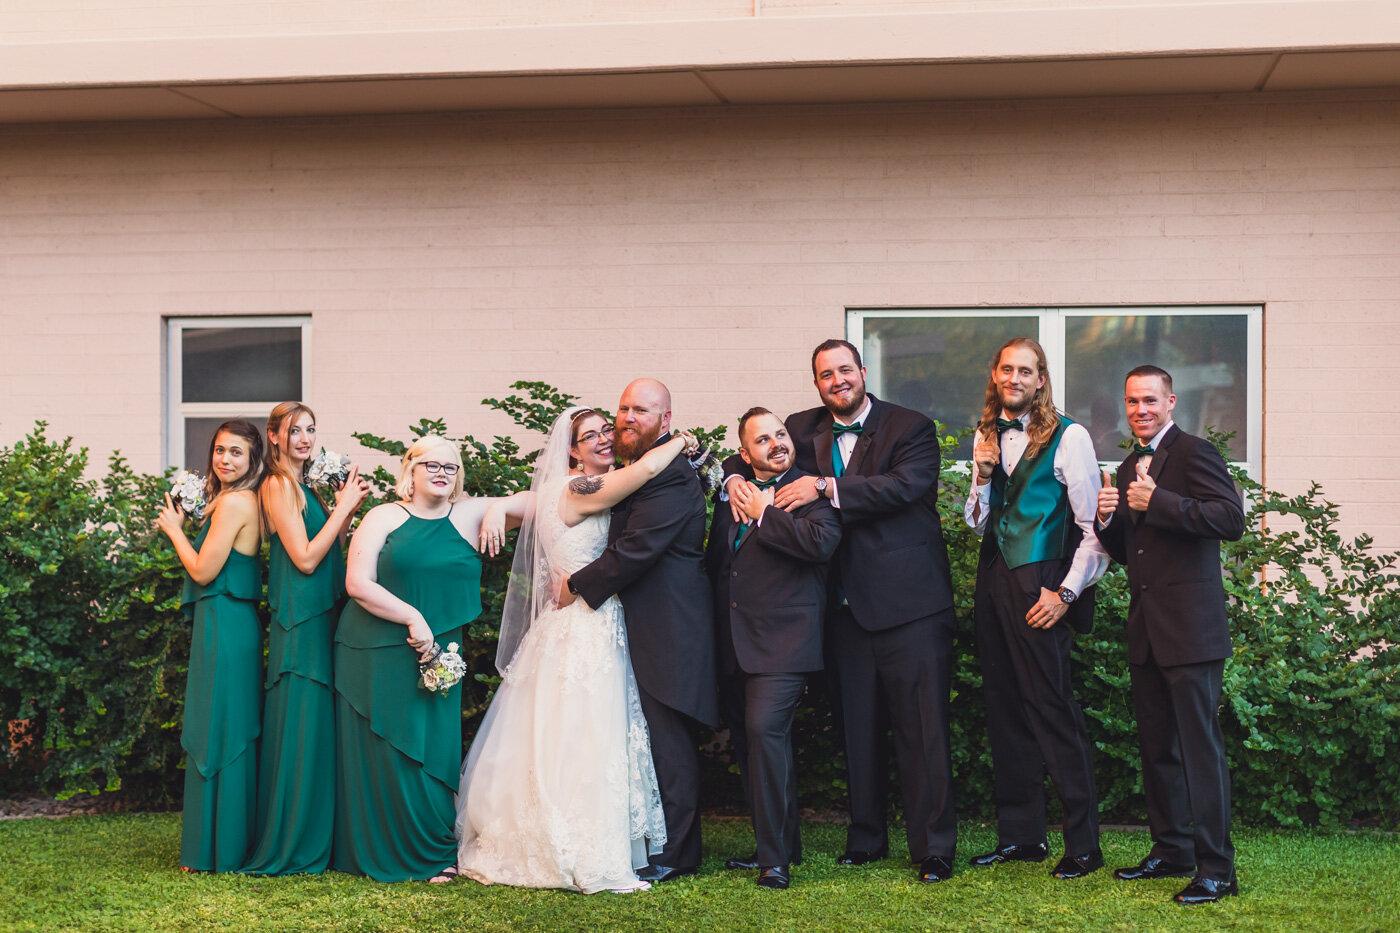 phoenix-wedding-party-fun-group-shot